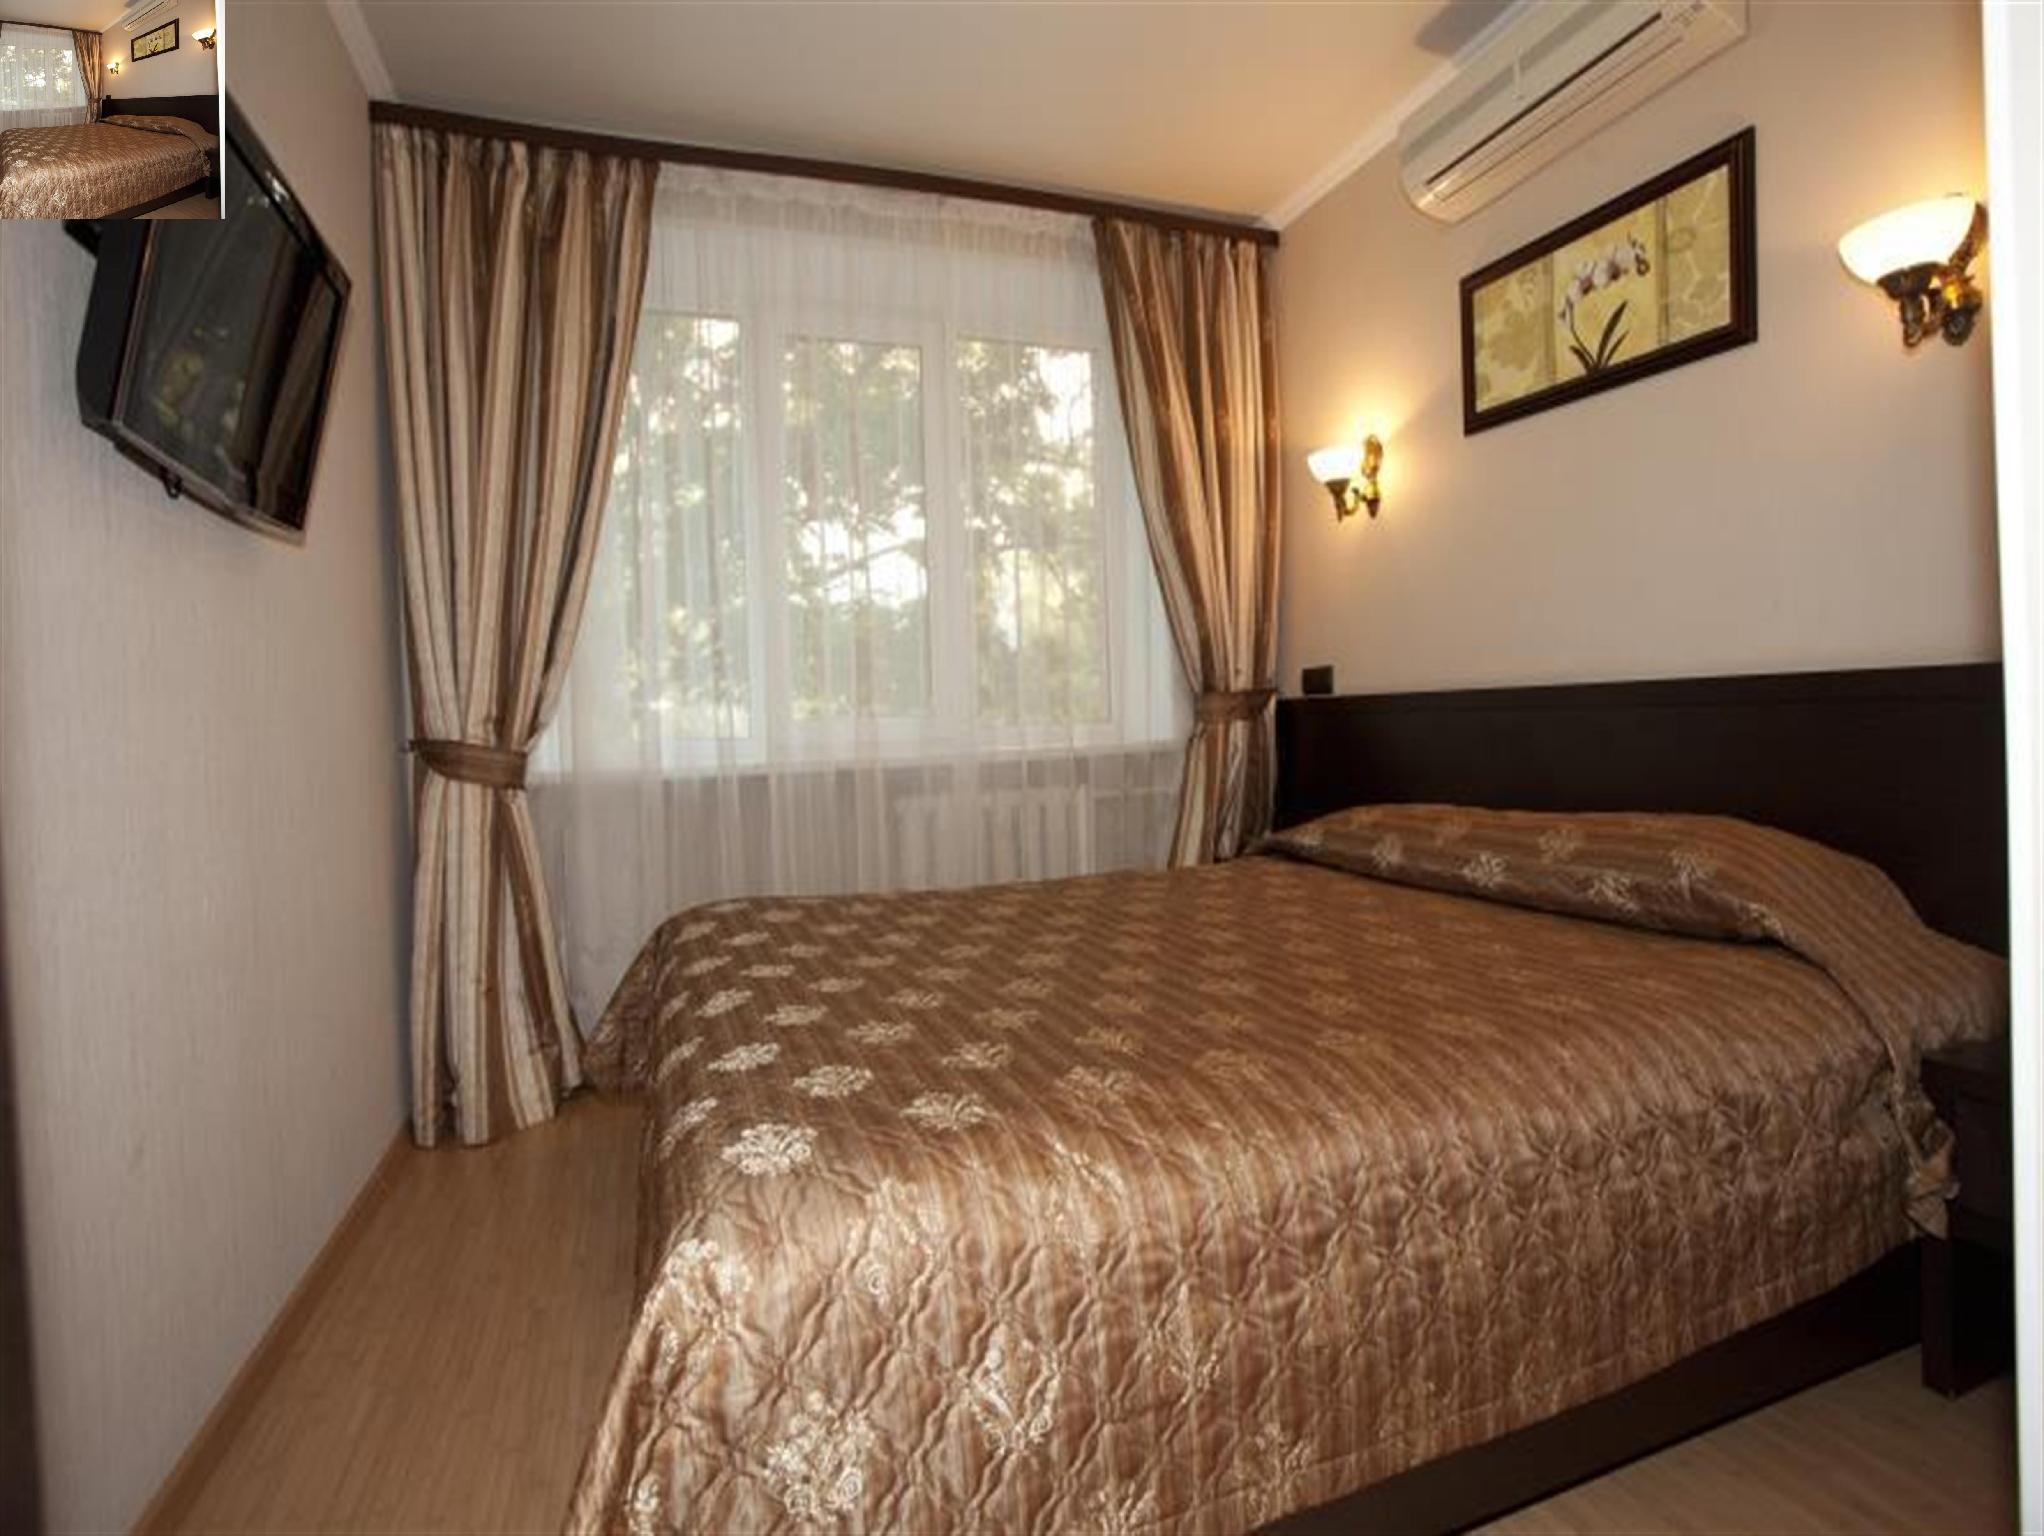 Koco Nikki | Save 10-30% on Hotels